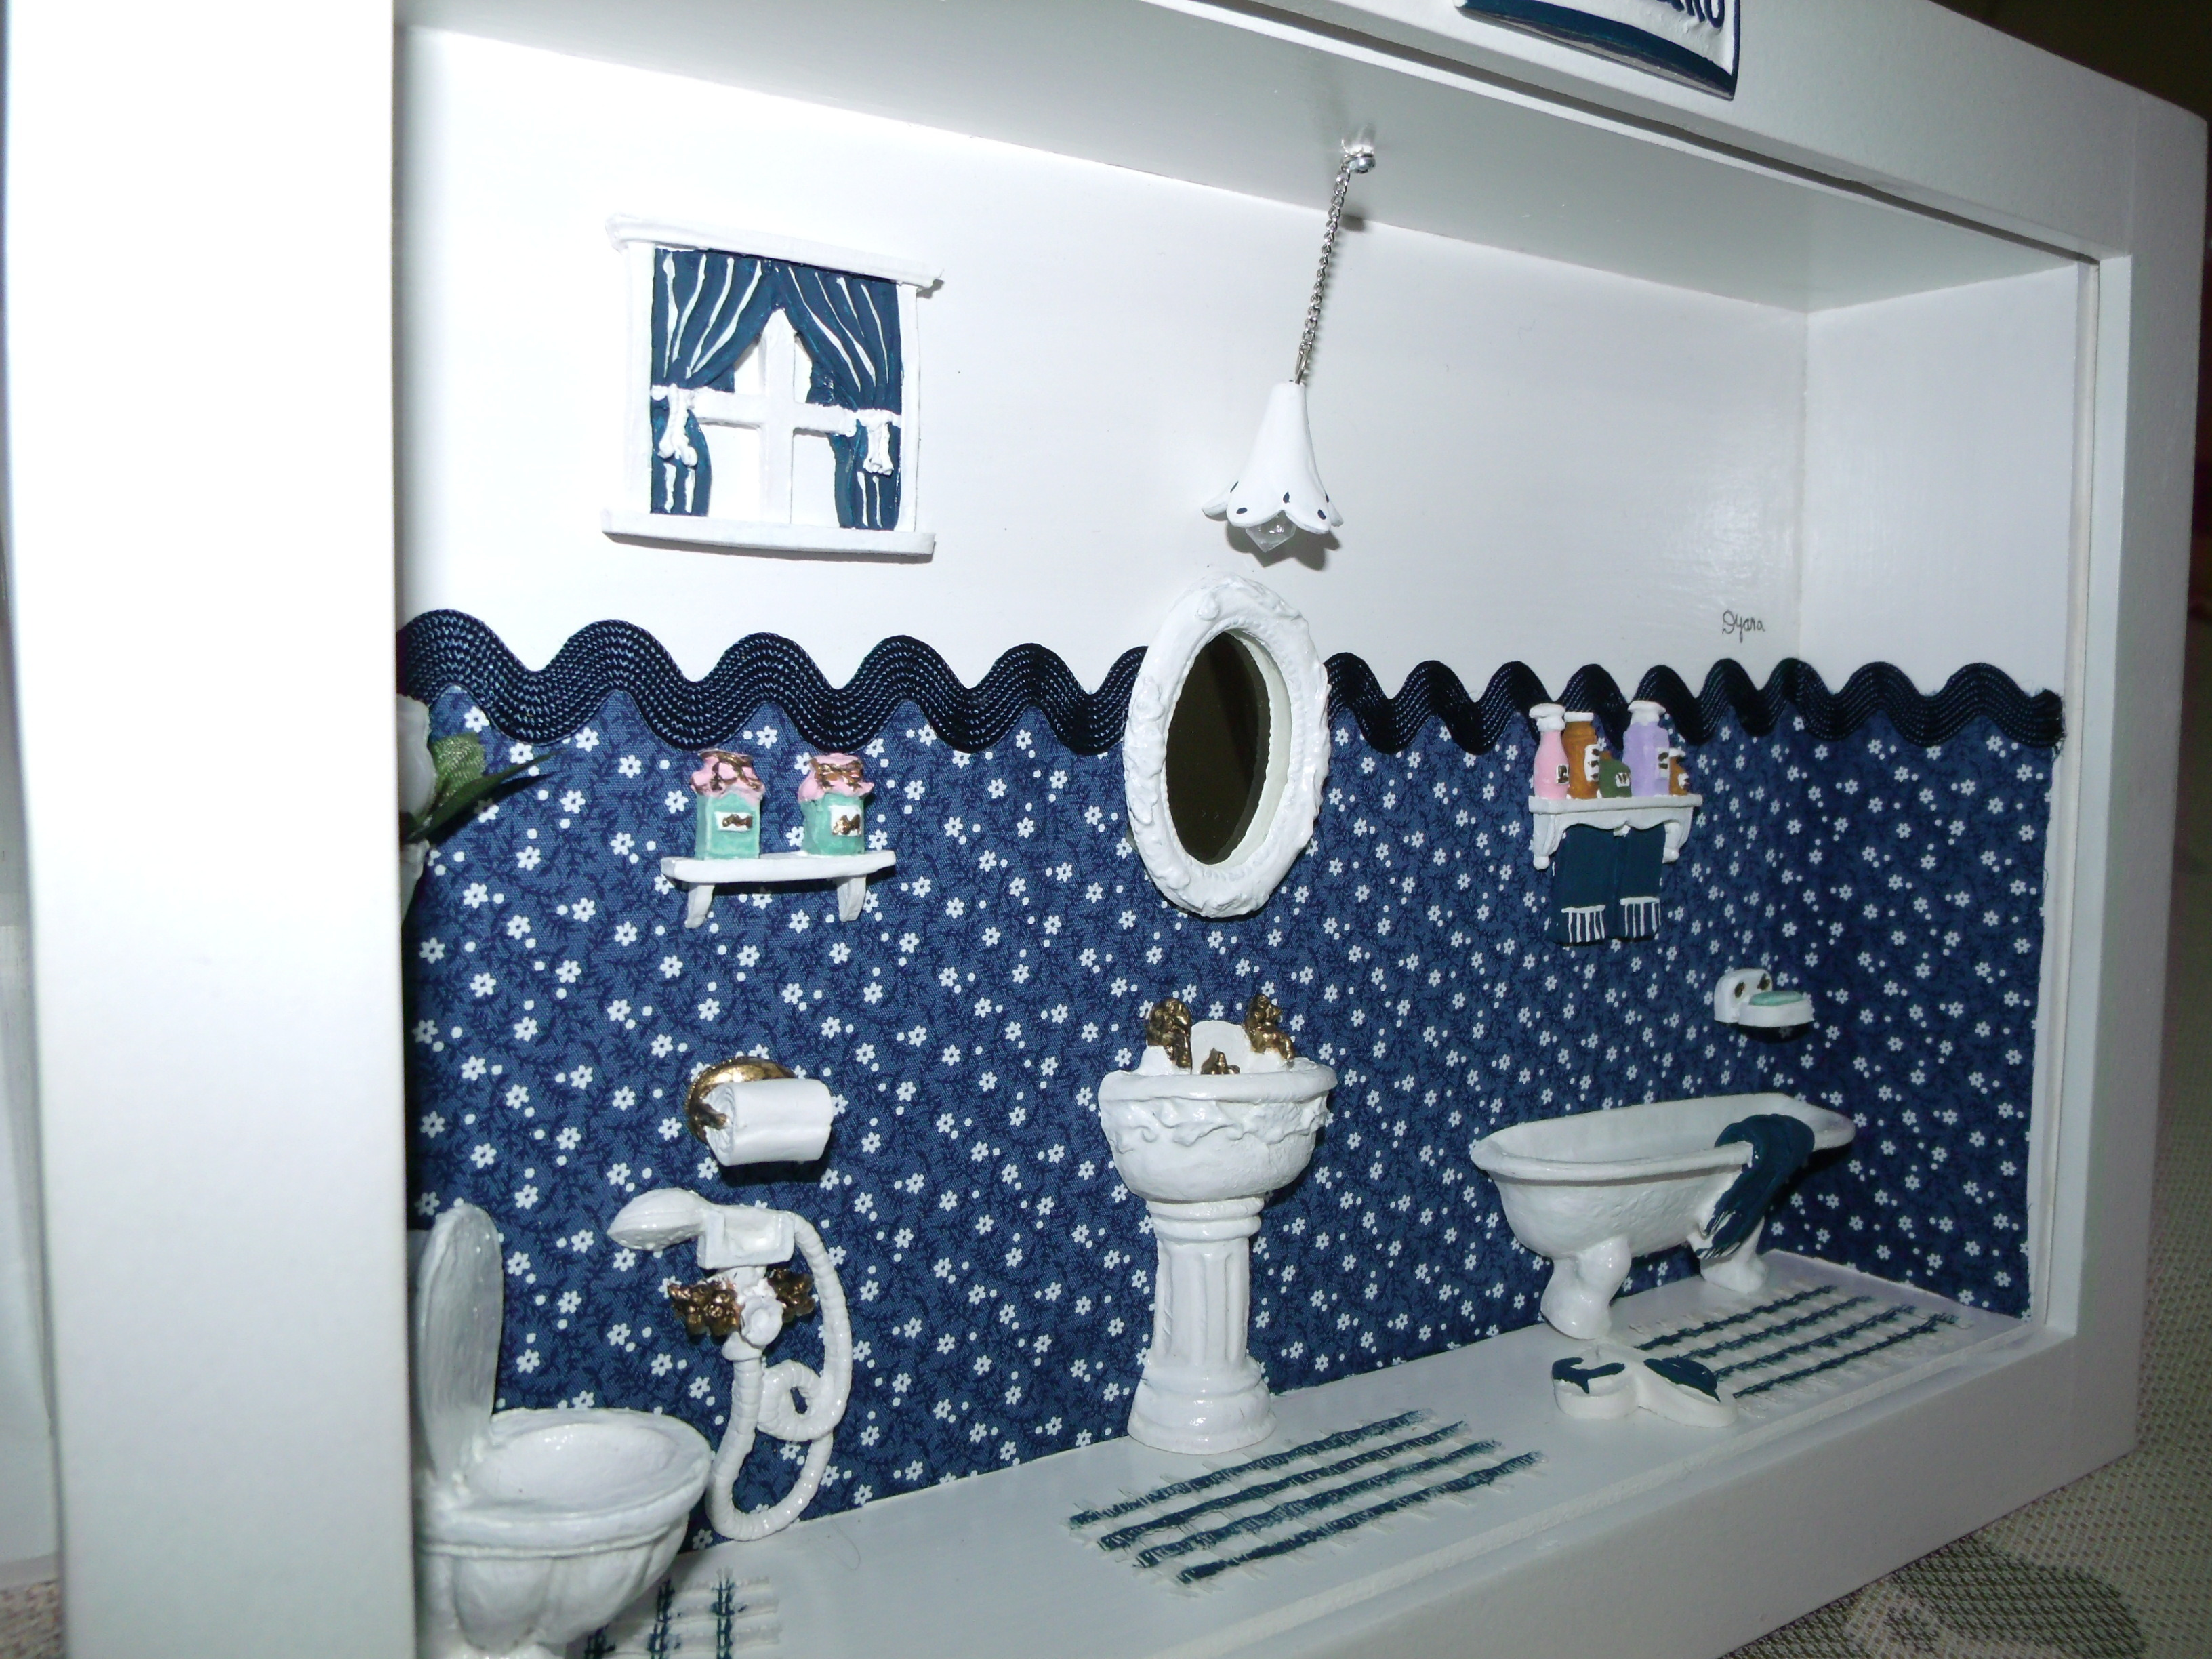 azul marinho Banheiro azul marinho Banheiro azul marinho Banheiro azul  #2A4267 3264 2448